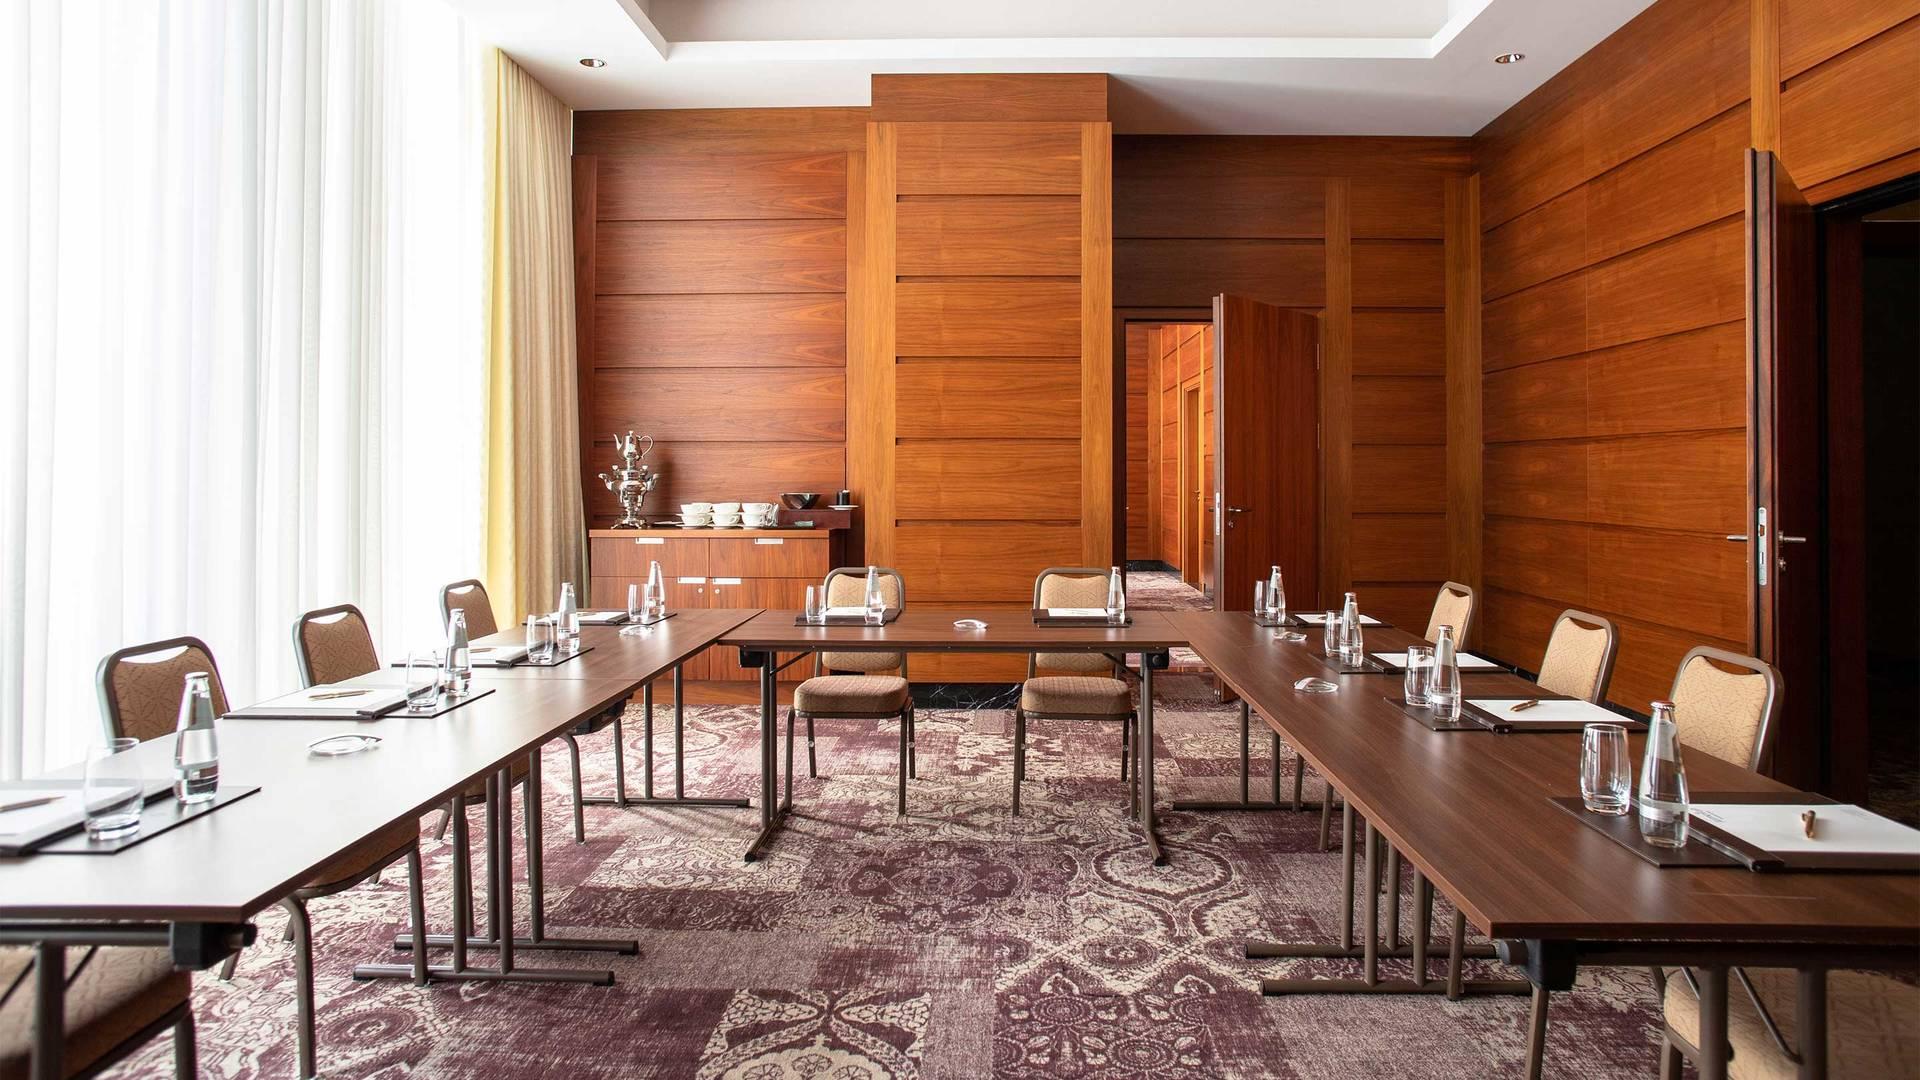 https://cdn.jumeirah.com/-/mediadh/DH/Hospitality/Jumeirah/Hotels/Frankfurt/Jumeirah-Frankfurt/Meeting-Rooms/16-9_Jumeirah-Frankfurt-L-tables-Meeting-Room-2_landscape.jpg?h=1080&w=1920&hash=997C39499A92828FCC4FDAEE6446CD61